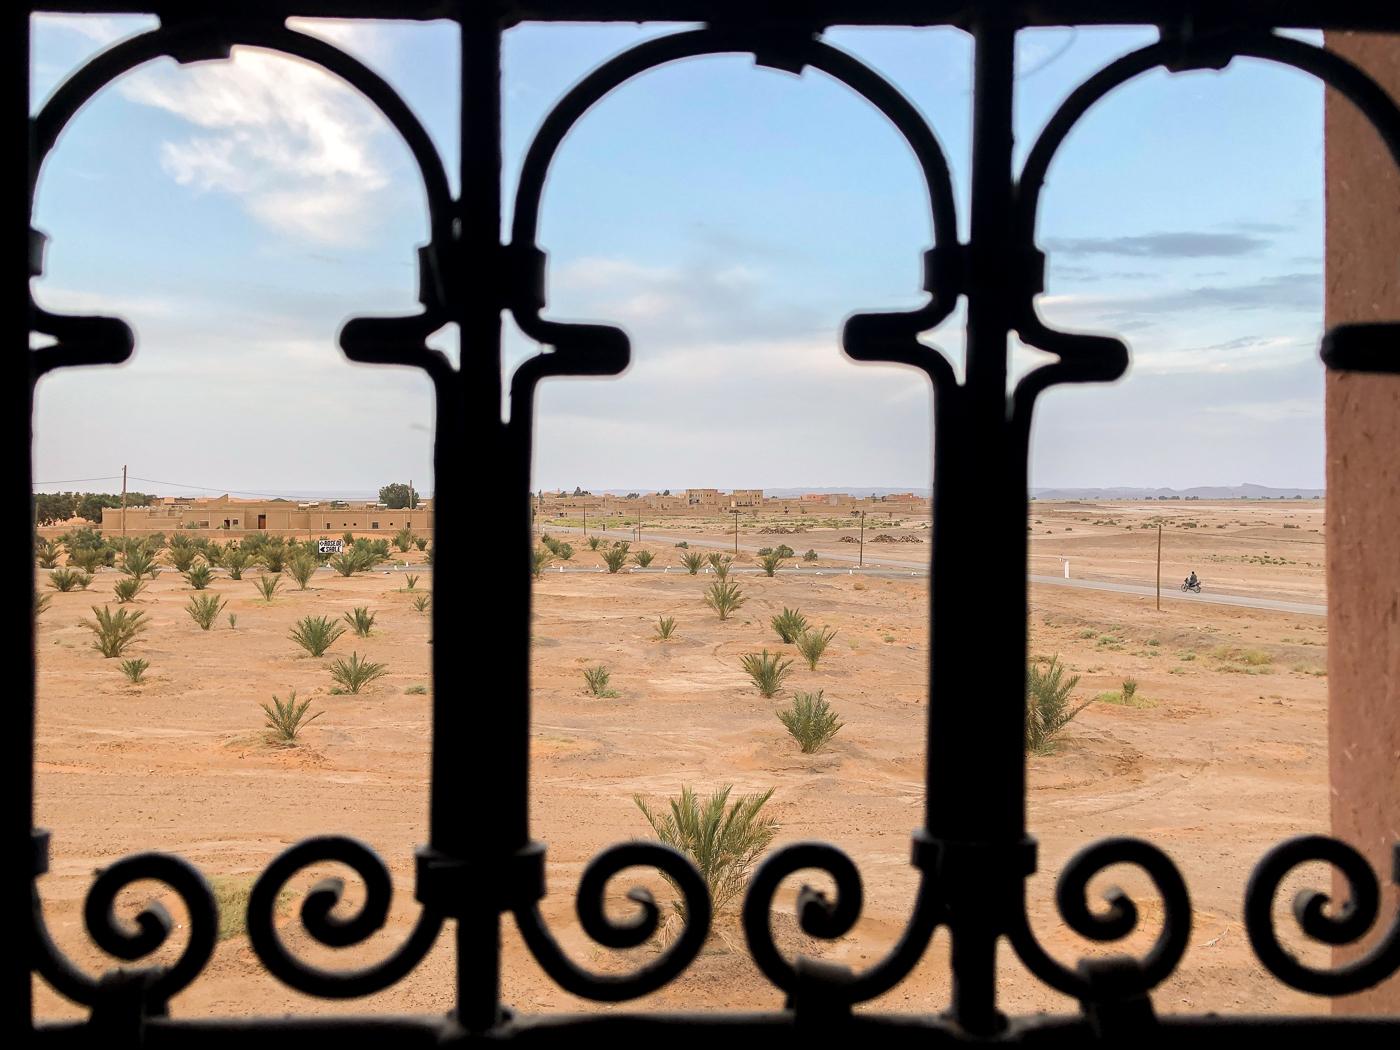 Vue du Riad Azawad dans le désert du Sahara au Maroc - Merzouga